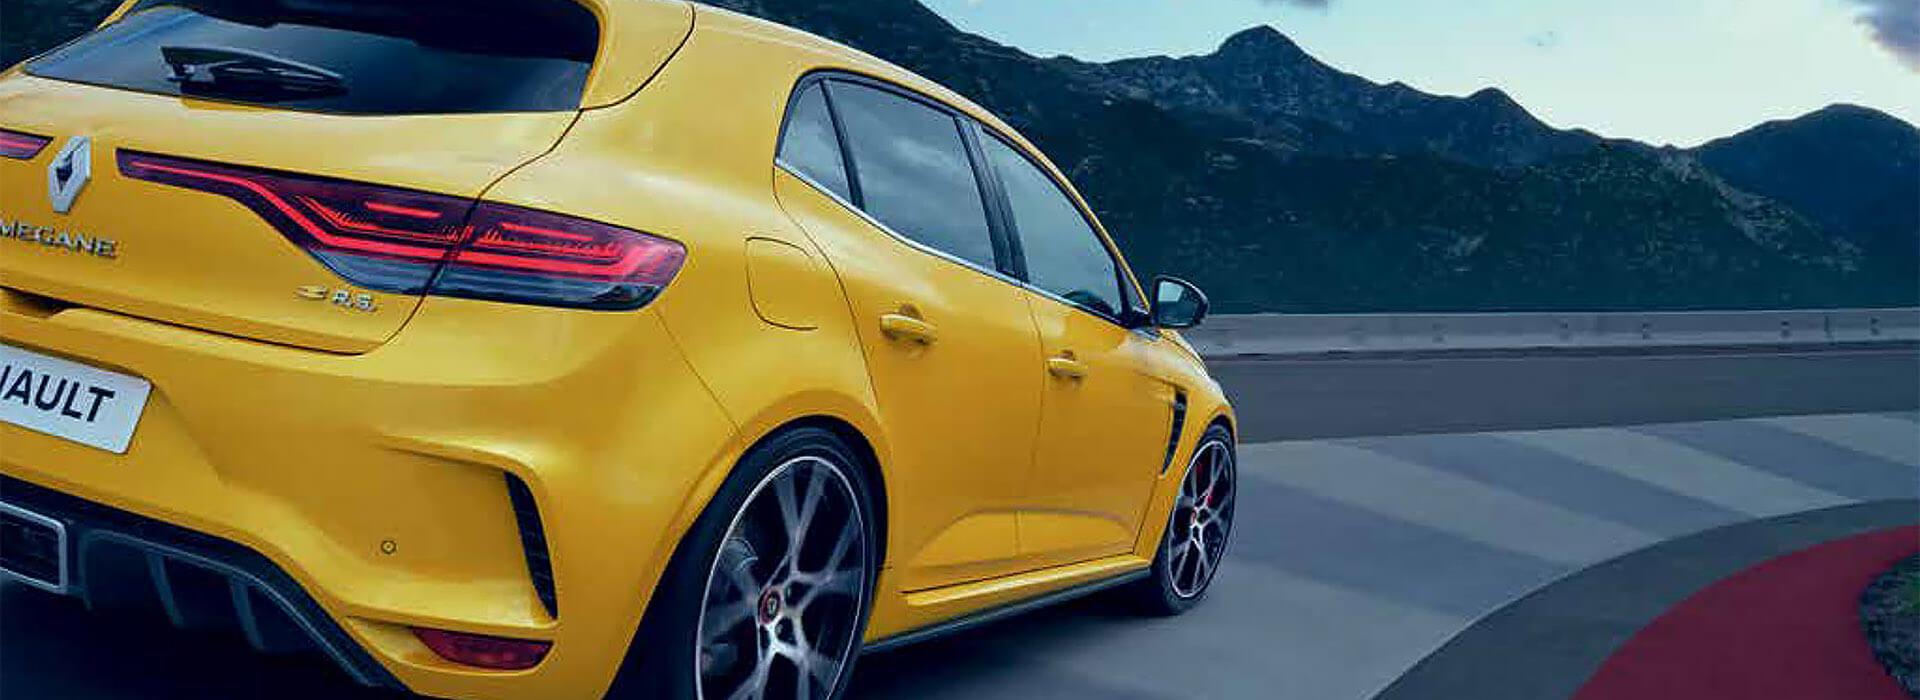 Cricks Maroochydore Renault Careers